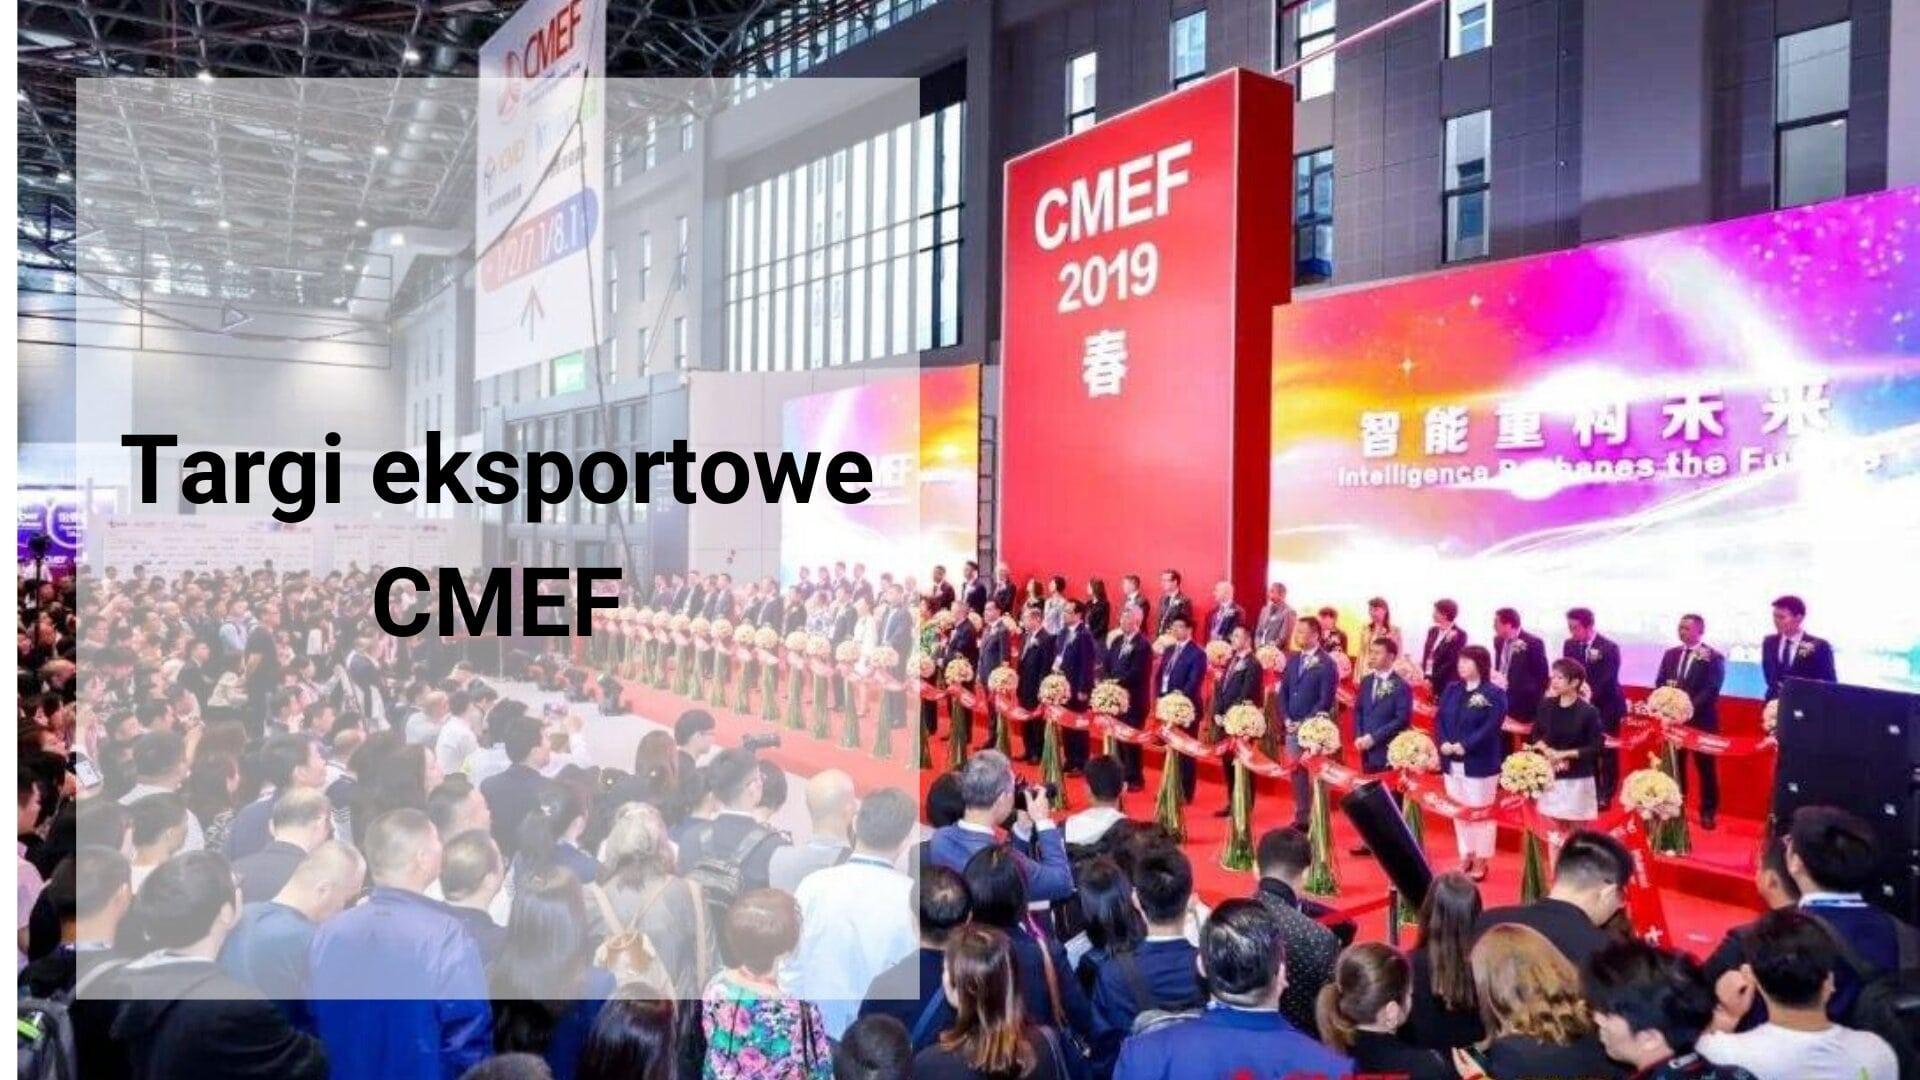 Targi eksportowe CMEF